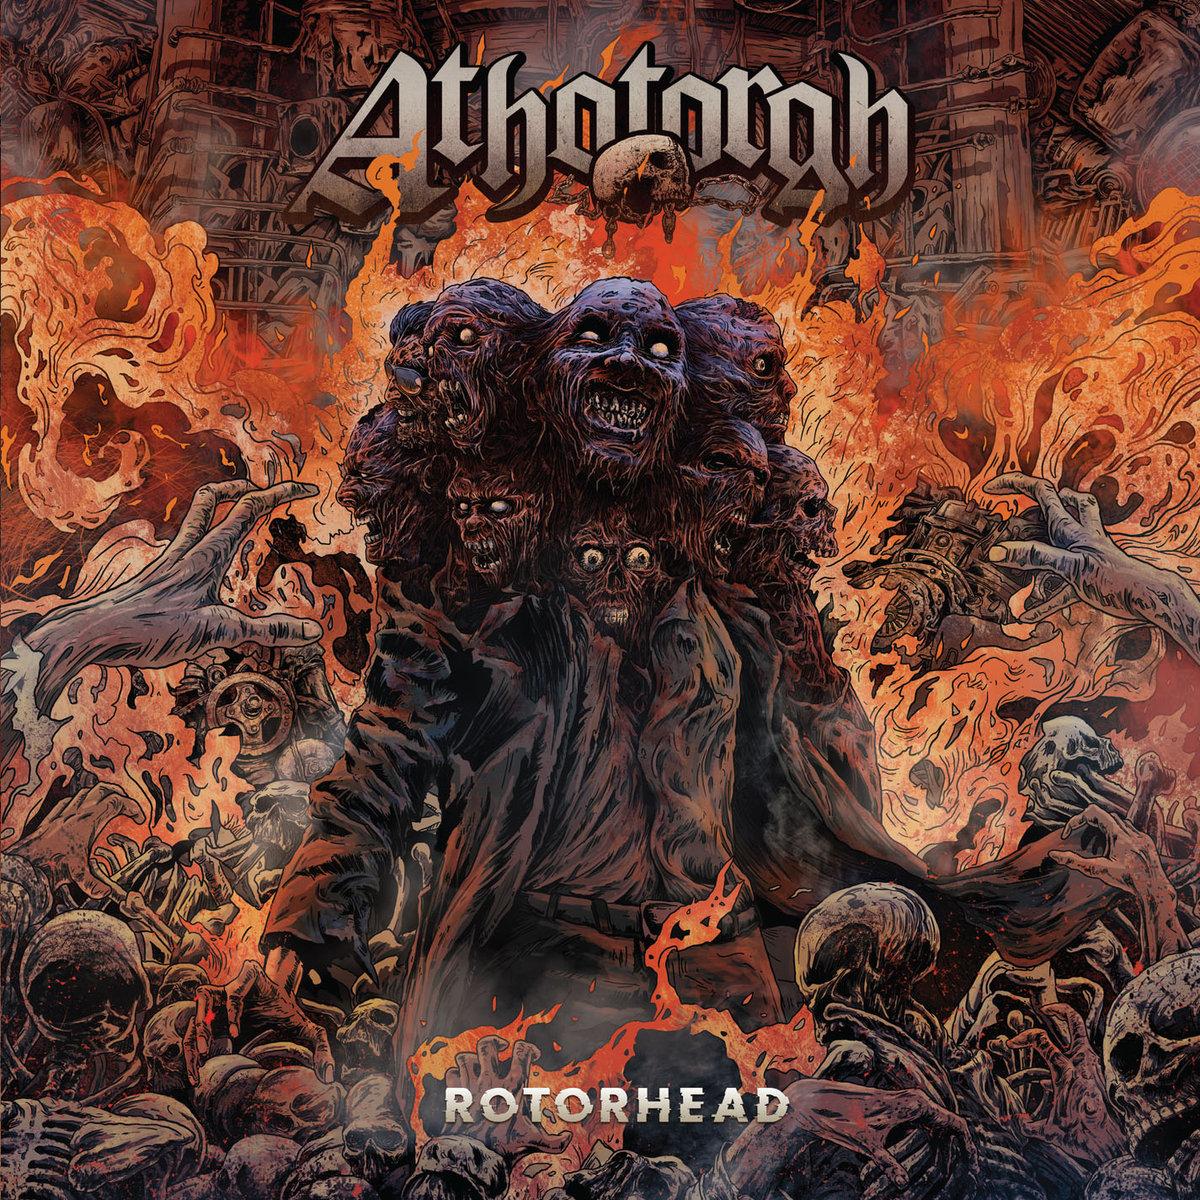 ATHOTORGH Rotorhead CD.jpg